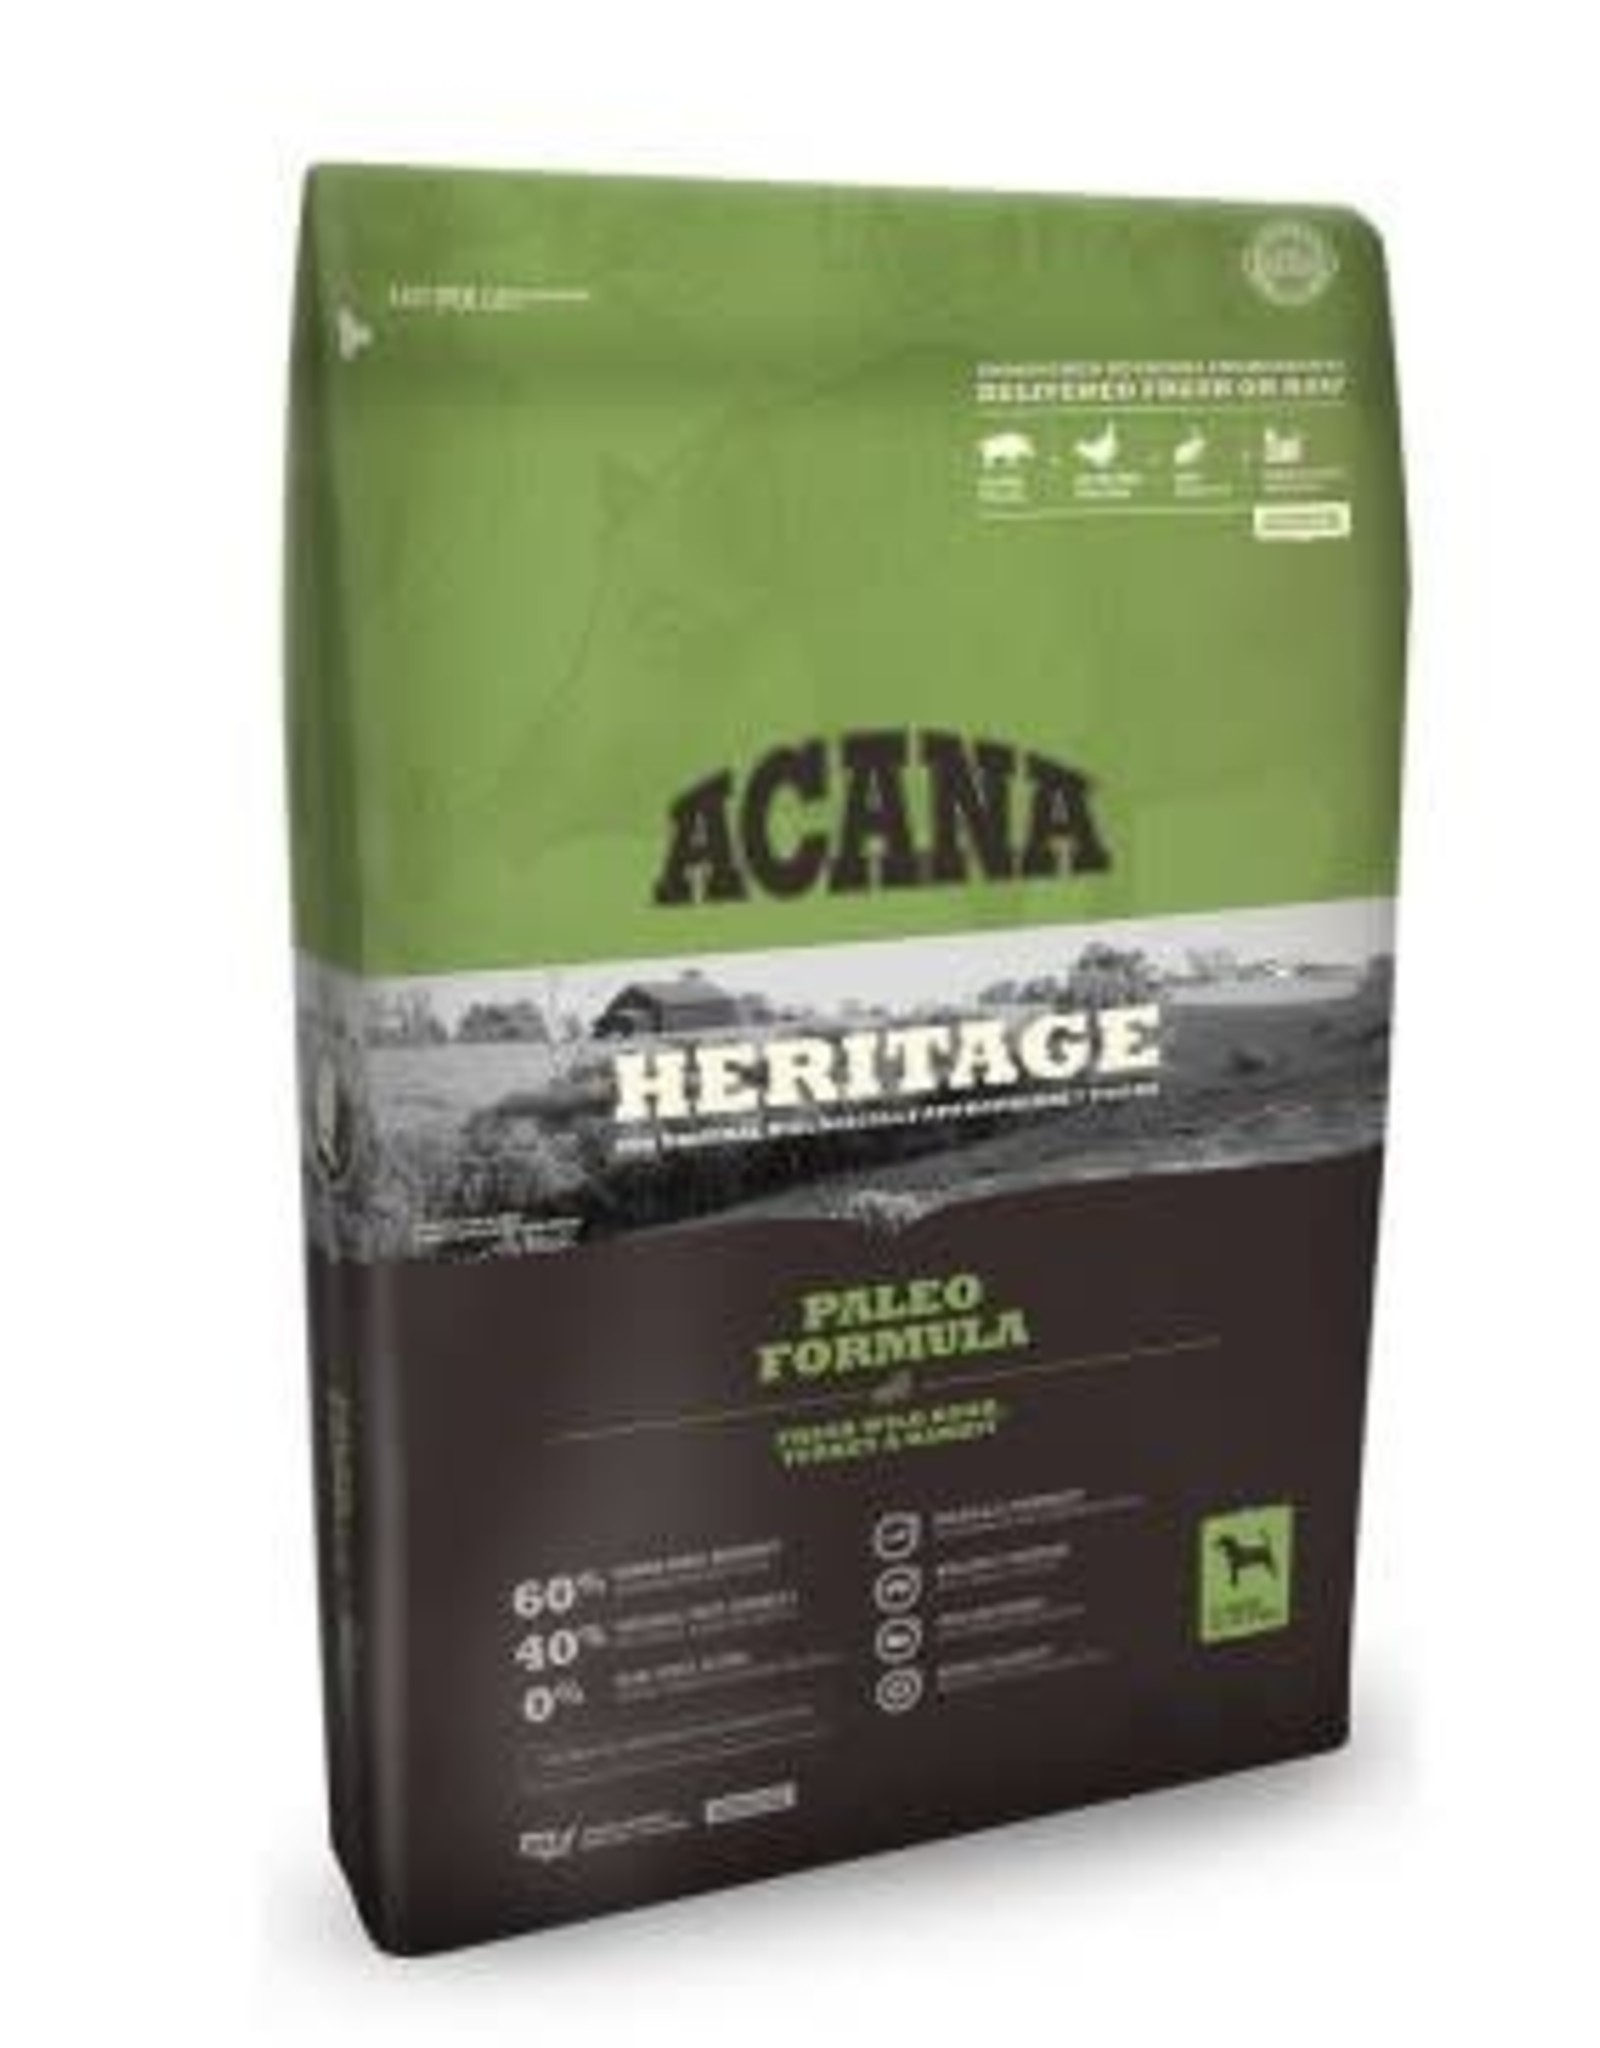 Acana ACANA Heritage Paleo/ Fresh Wild Boar, Turkey & Rabbit Dry Dog Food-